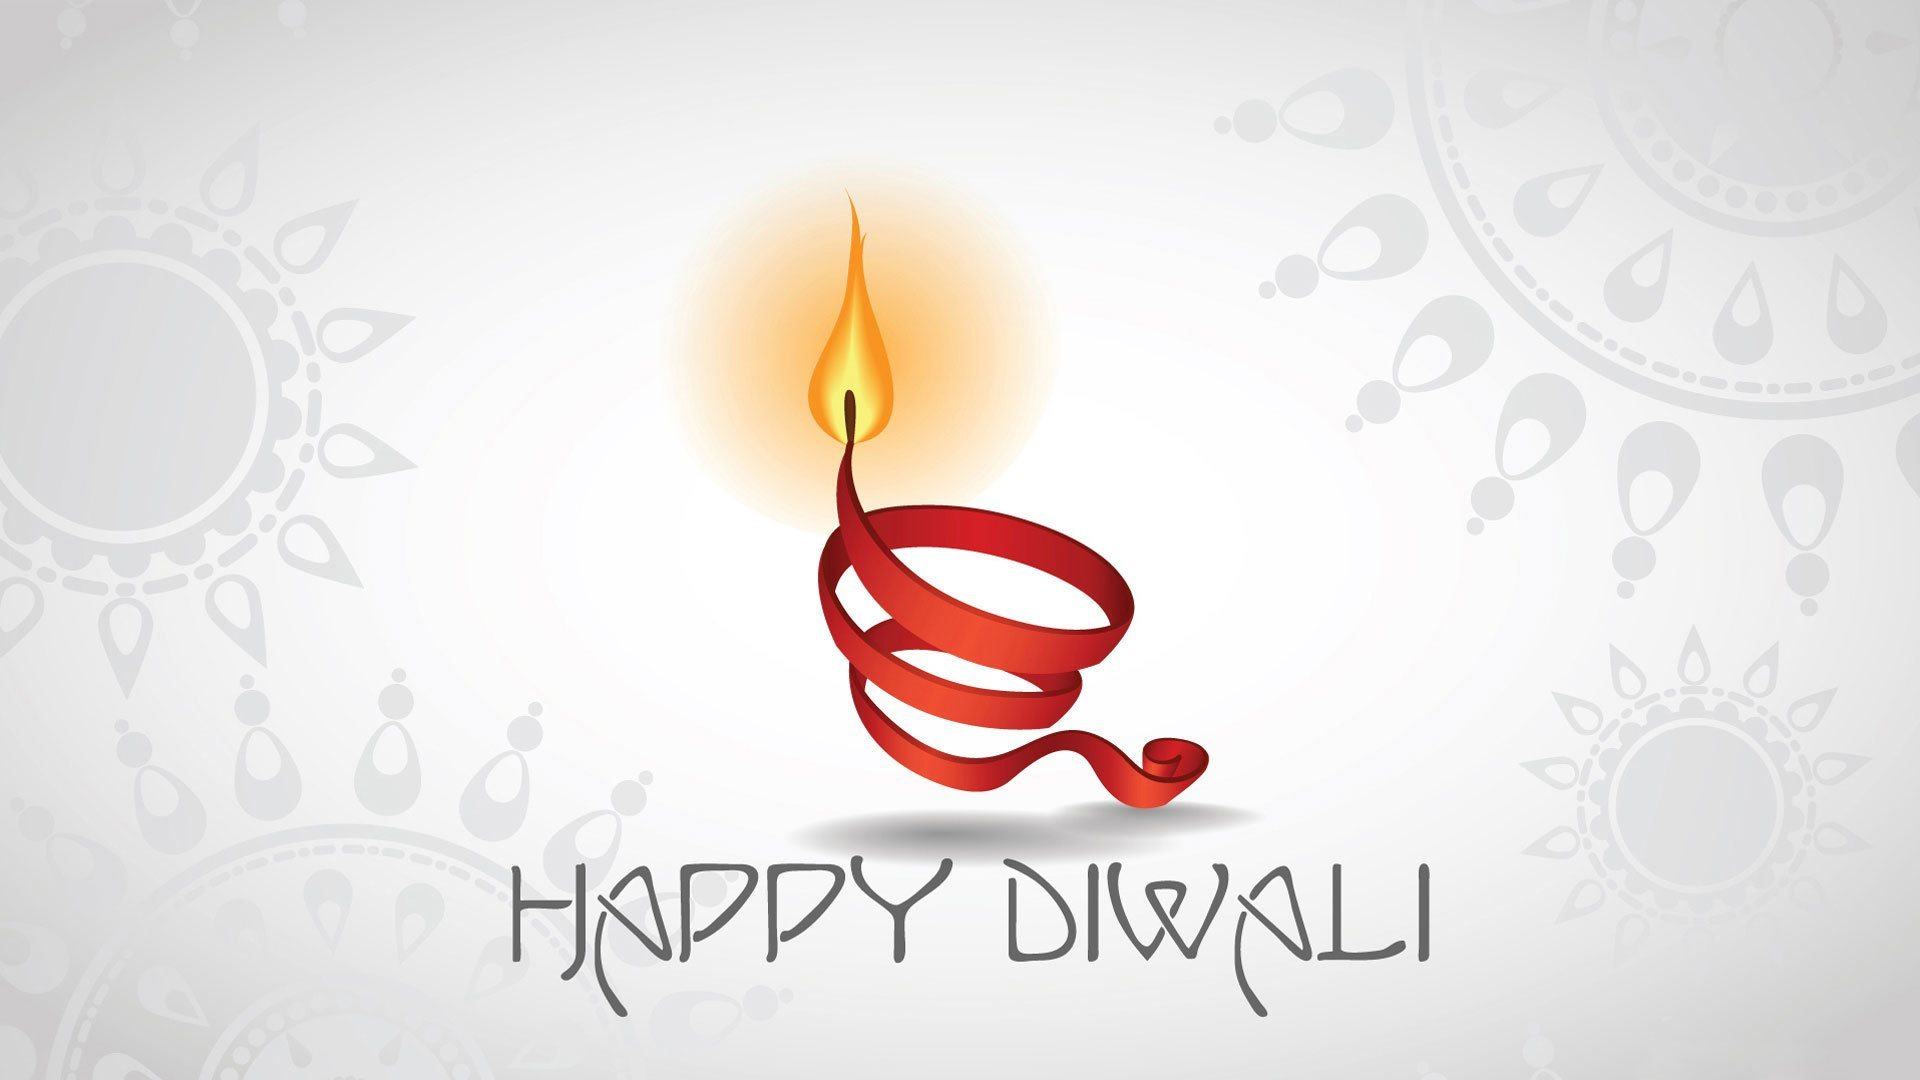 Happy Diwali Images 2017 | Diwali Wallpapers HD | Free ...